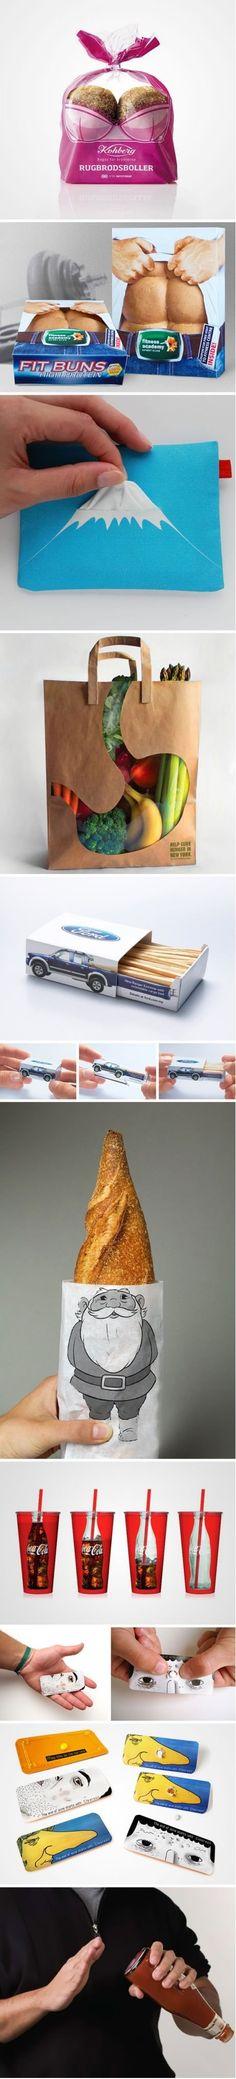 Brilliant packaging.